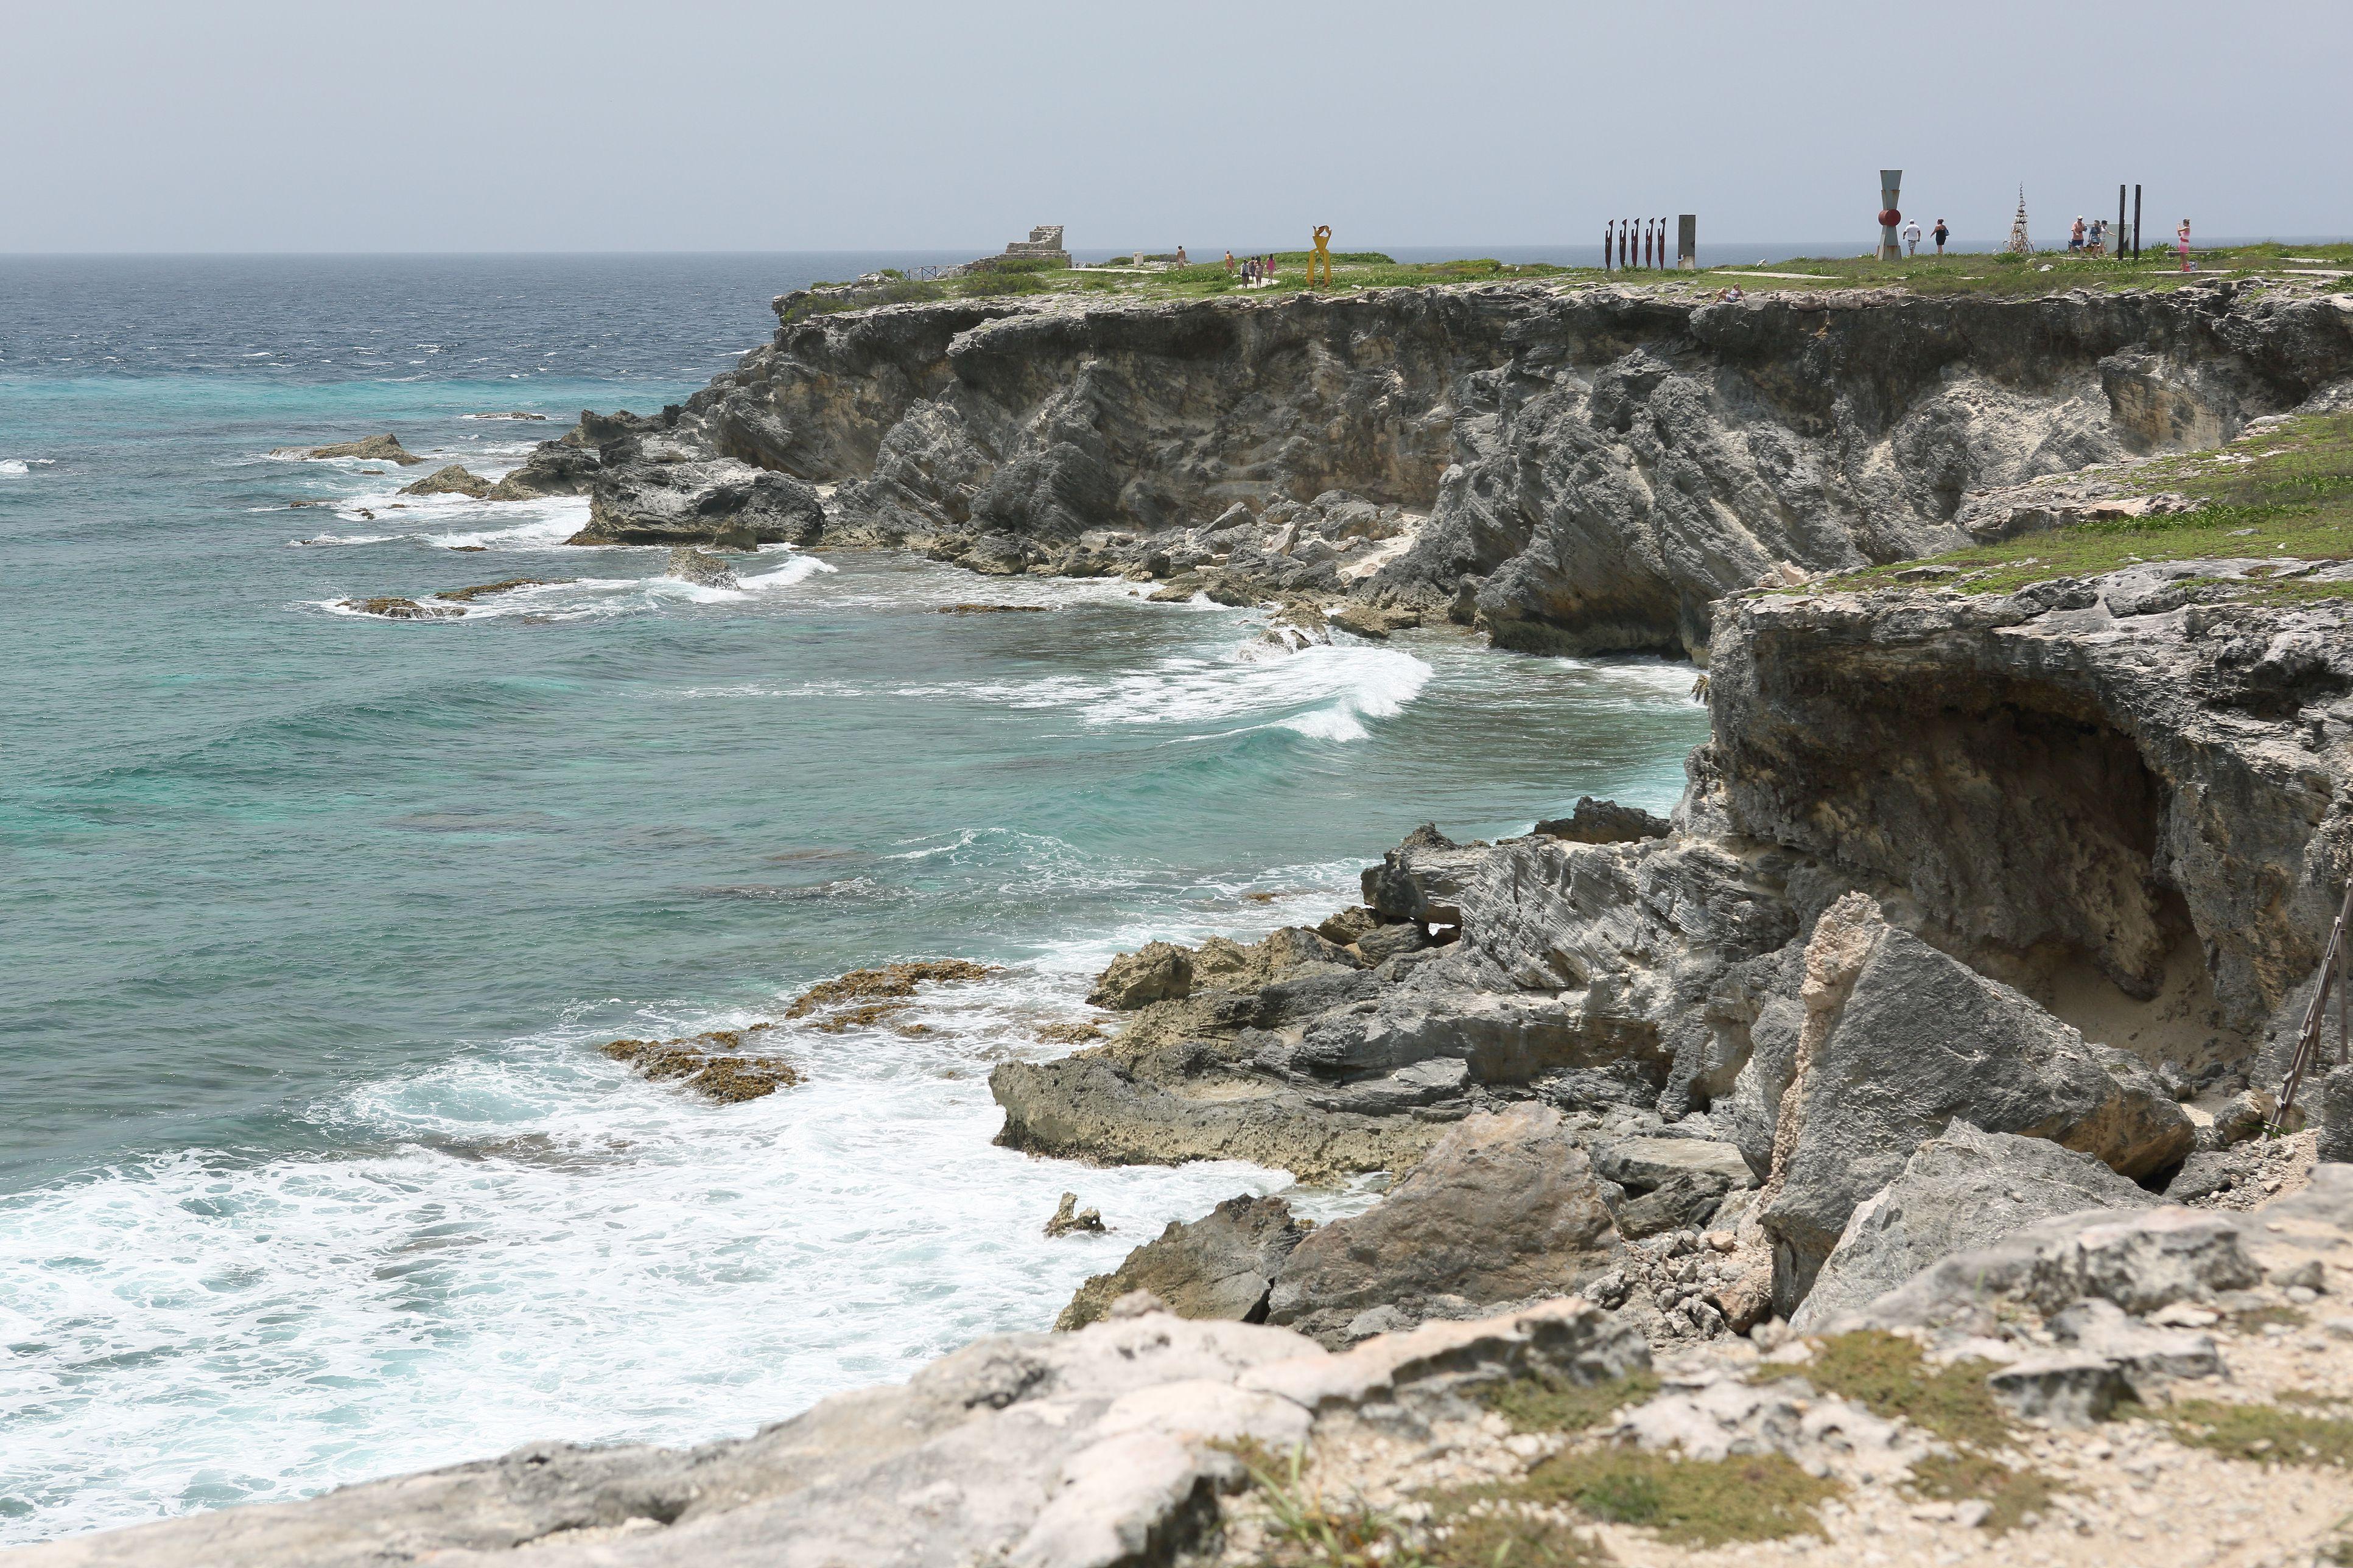 Punta Sur on Isla Mujeres, Quintana Roo